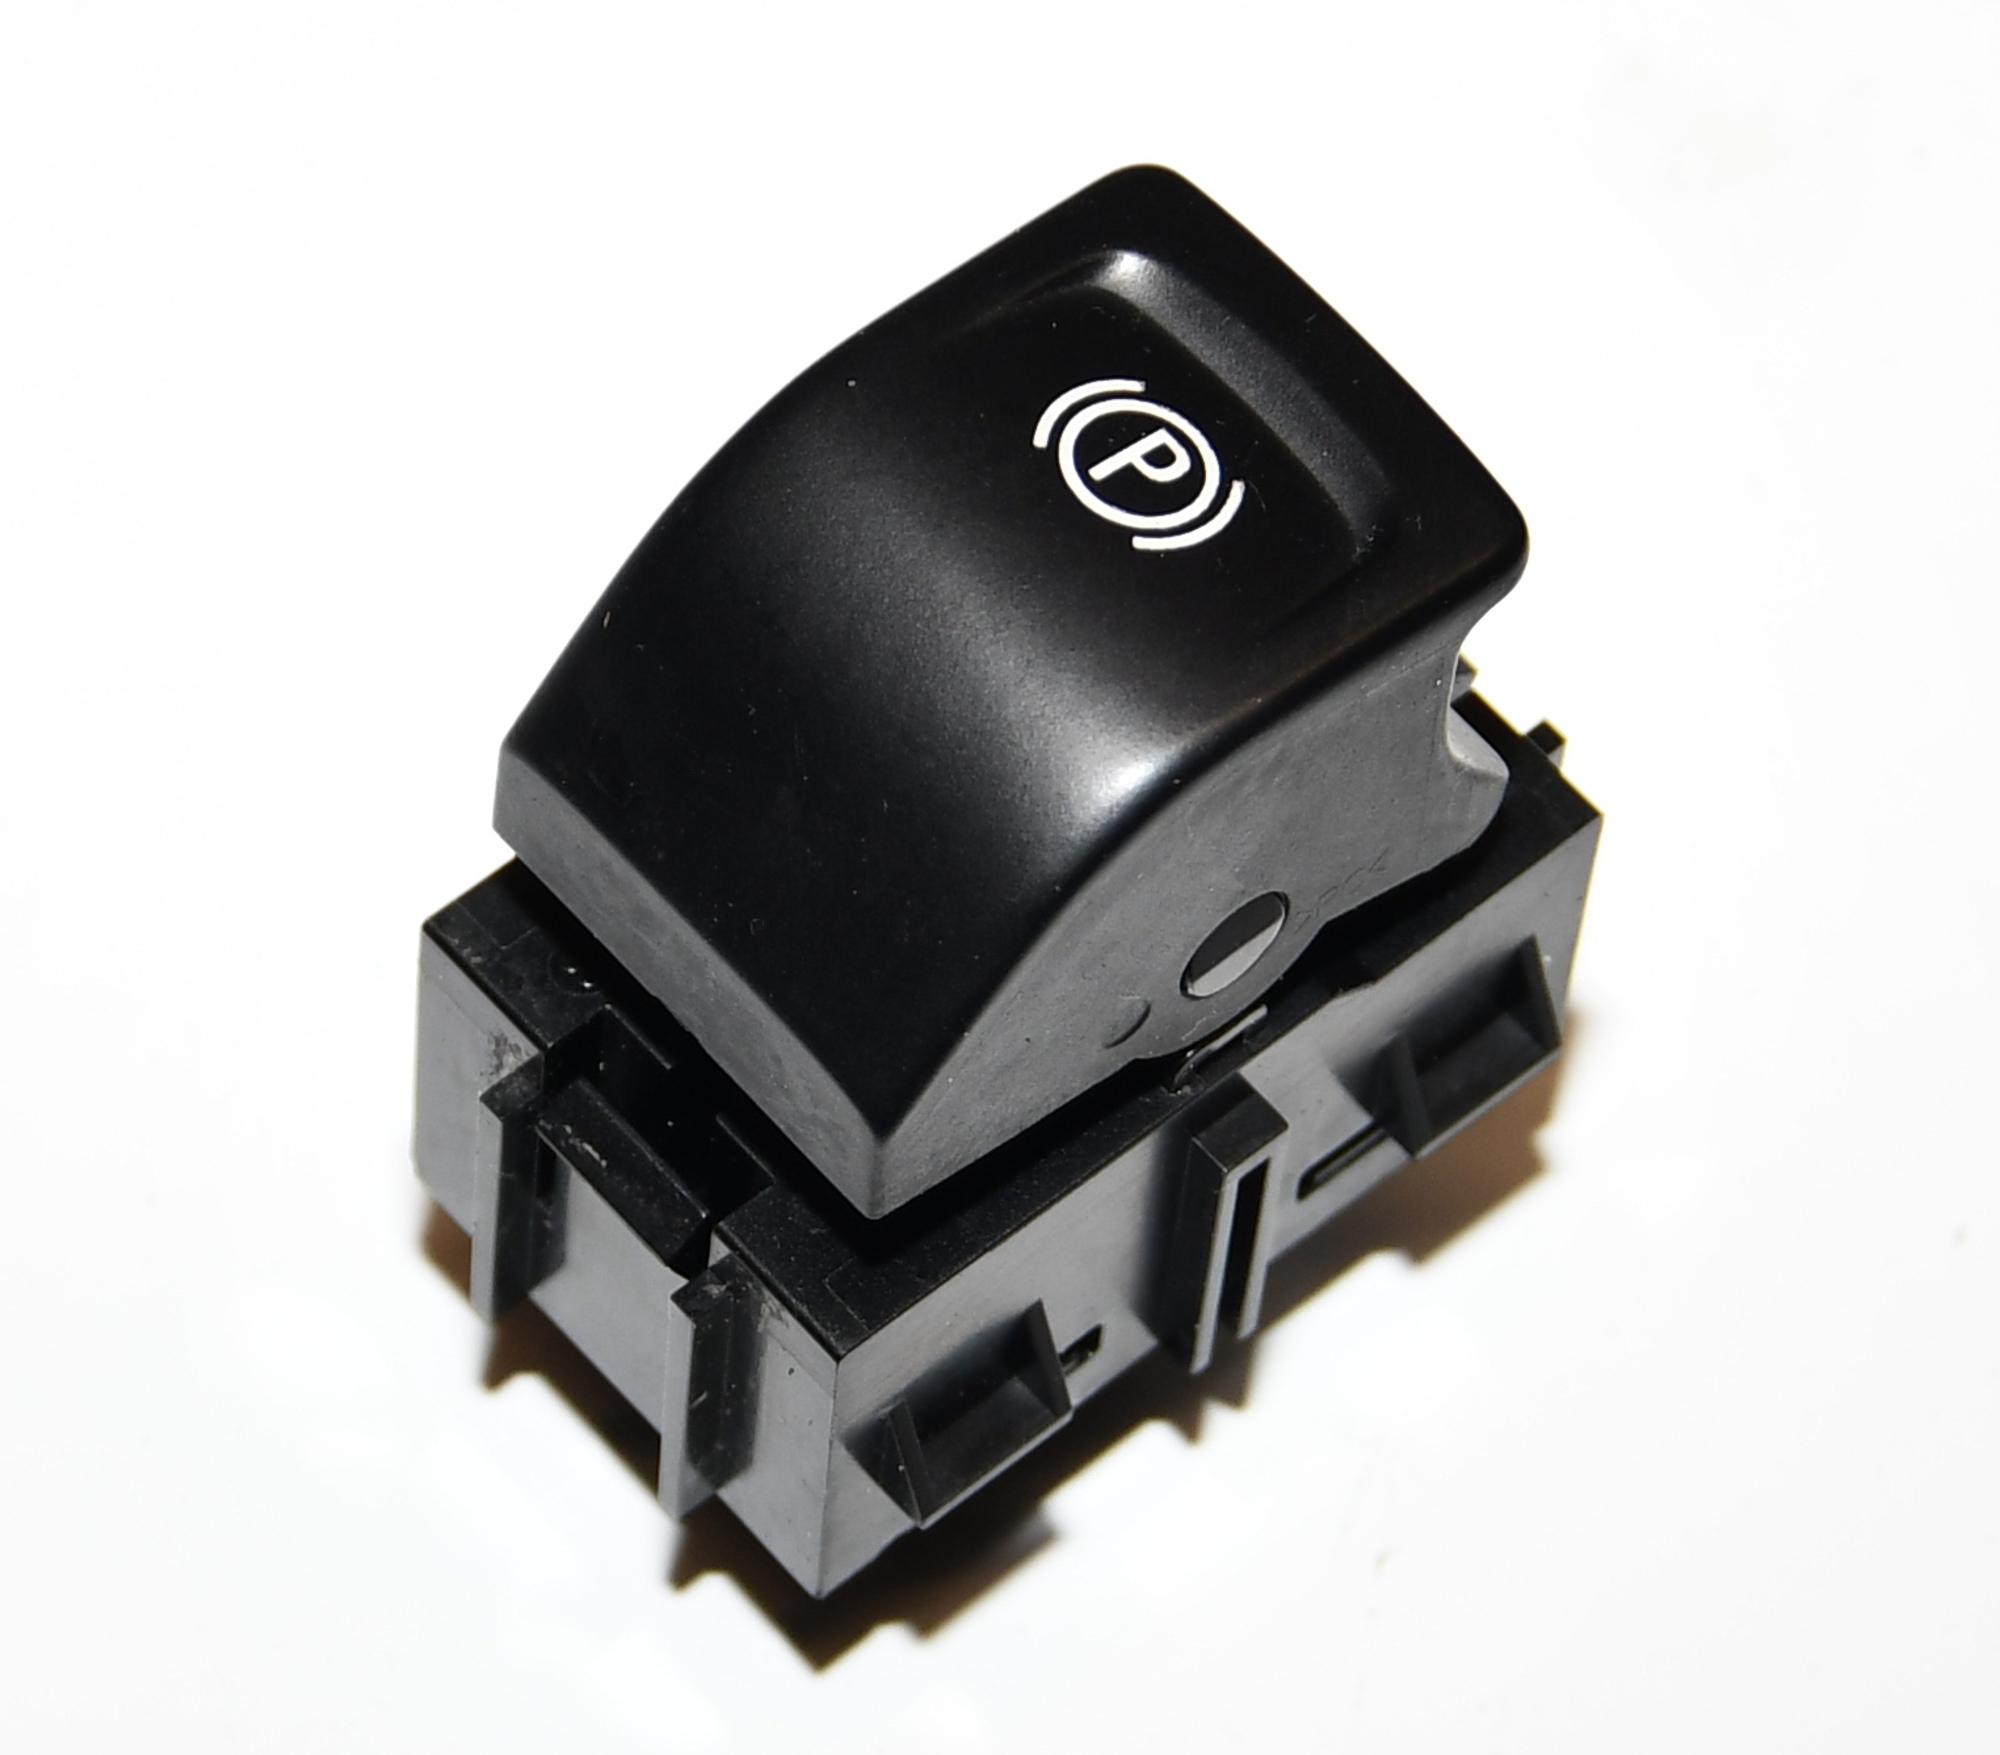 Schalter Taster elektromechanische Feststellbremse  13271123 Meriva B Original